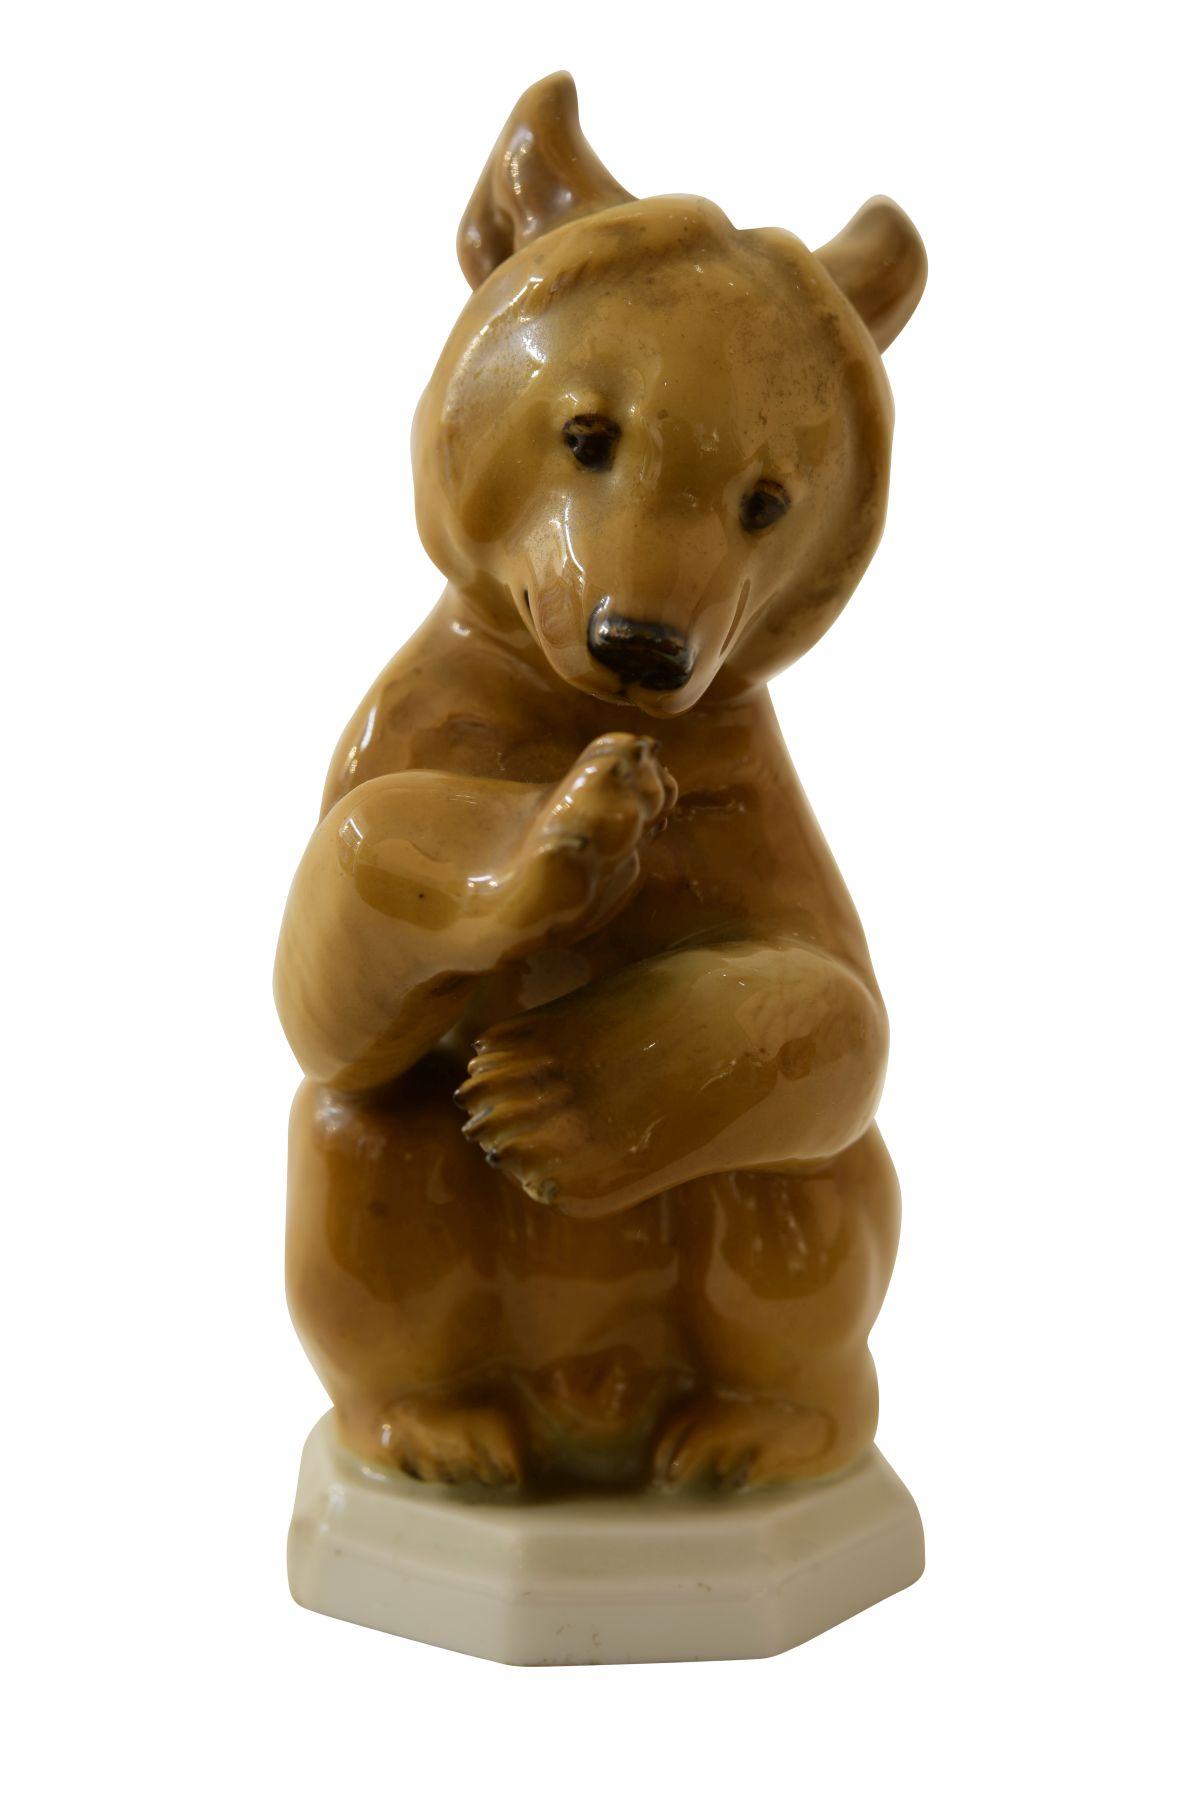 "#163 Angry Bear, Allach Porcelain Manufactory, Munich | ""Bär bittend"", Prozellanmanufaktur Allach, München Image"